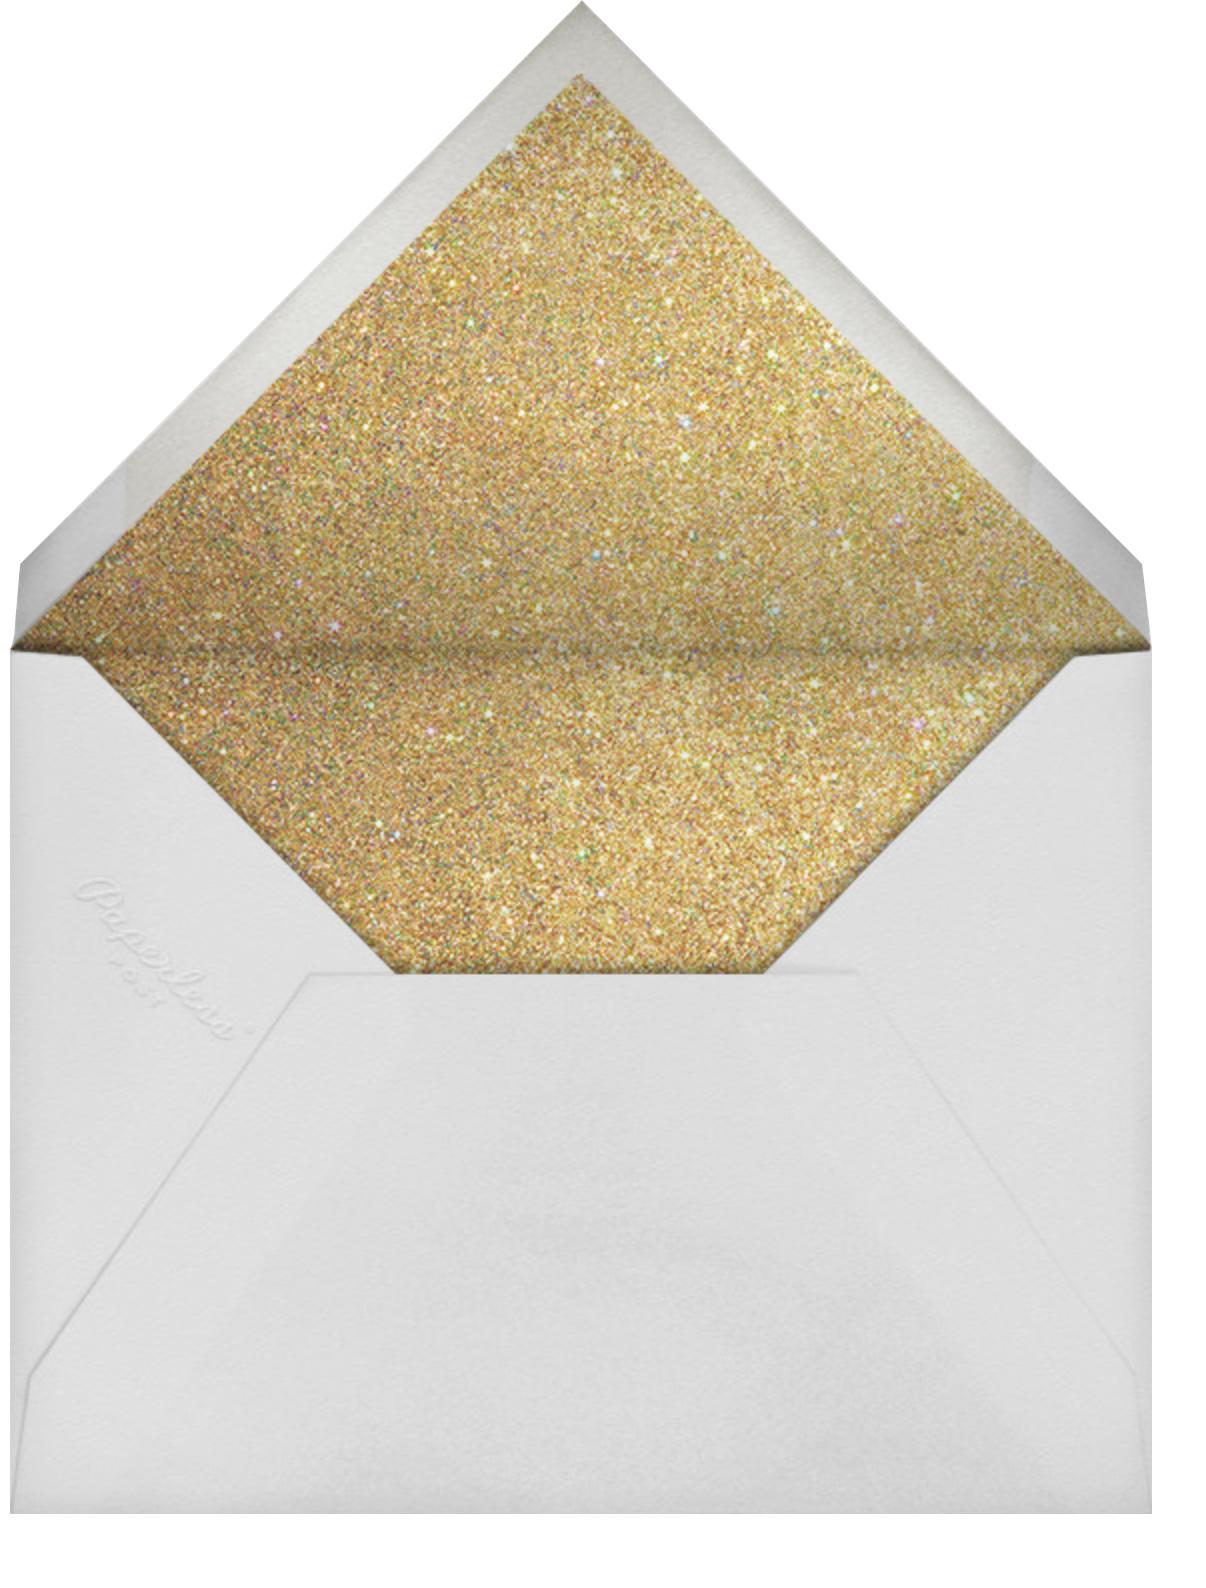 Balloons - Glitter - Paperless Post - Breonna Taylor birthday cards - envelope back